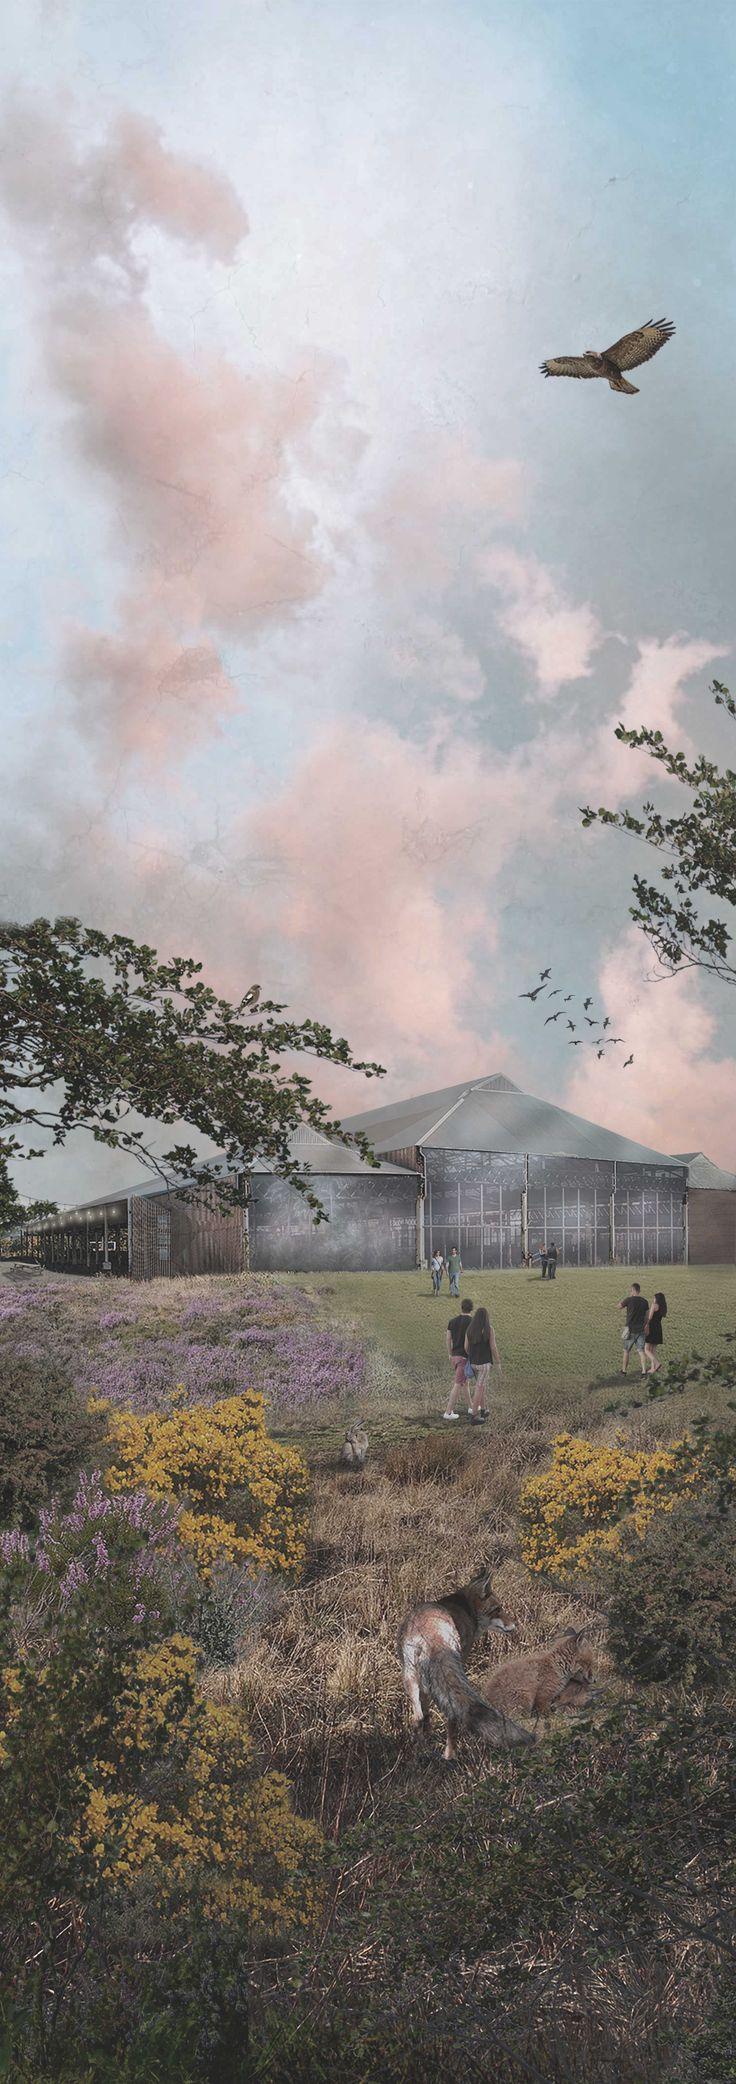 MSc Landscape Architecture - Edinburgh College of Art - Final Year Project Abattoir Park Visual, by Meg Johannessen (made with Photoshop)